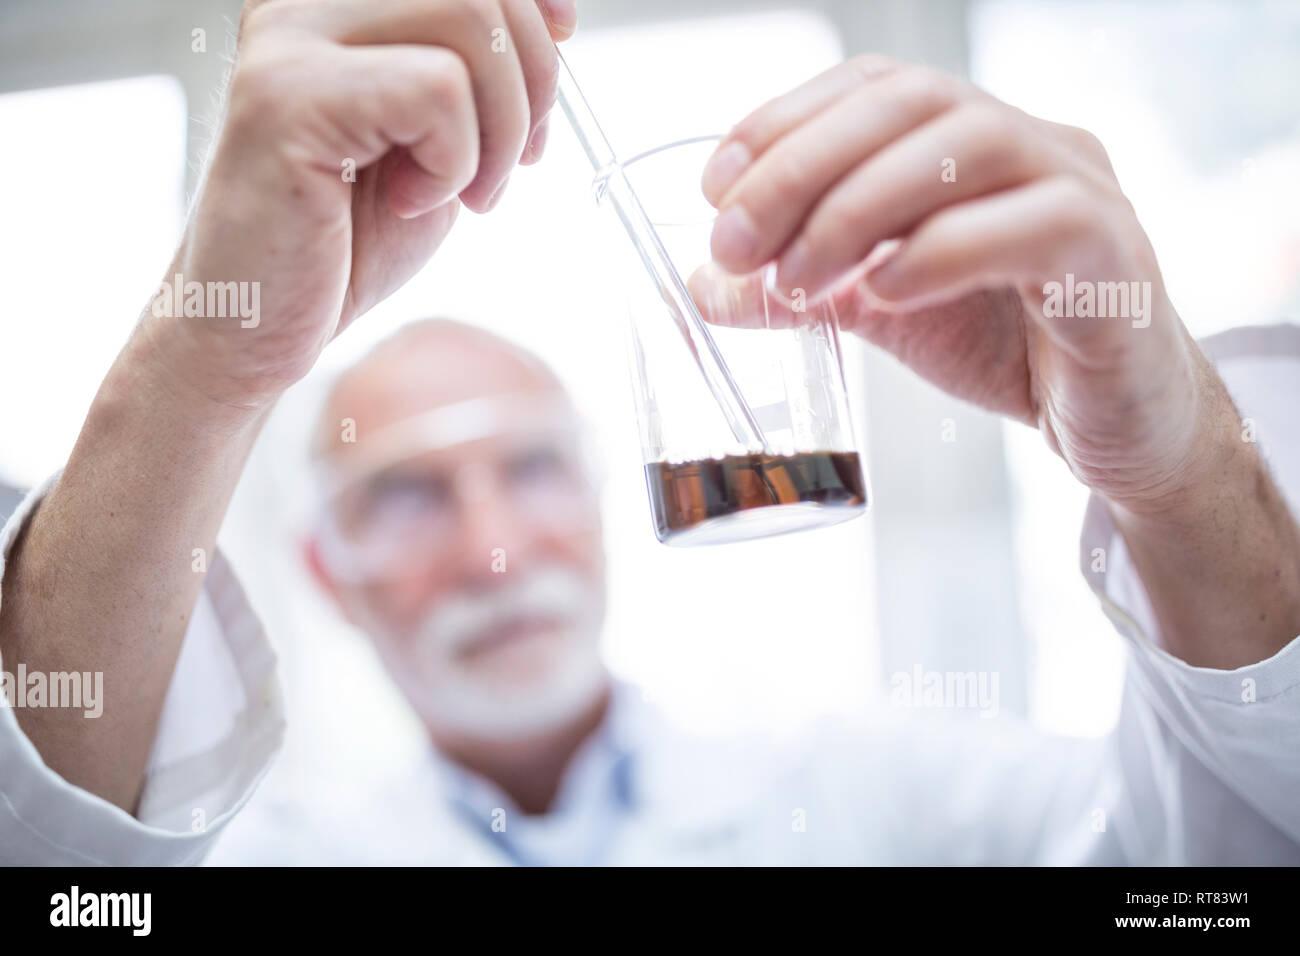 Man holding beaker in laboratory - Stock Image